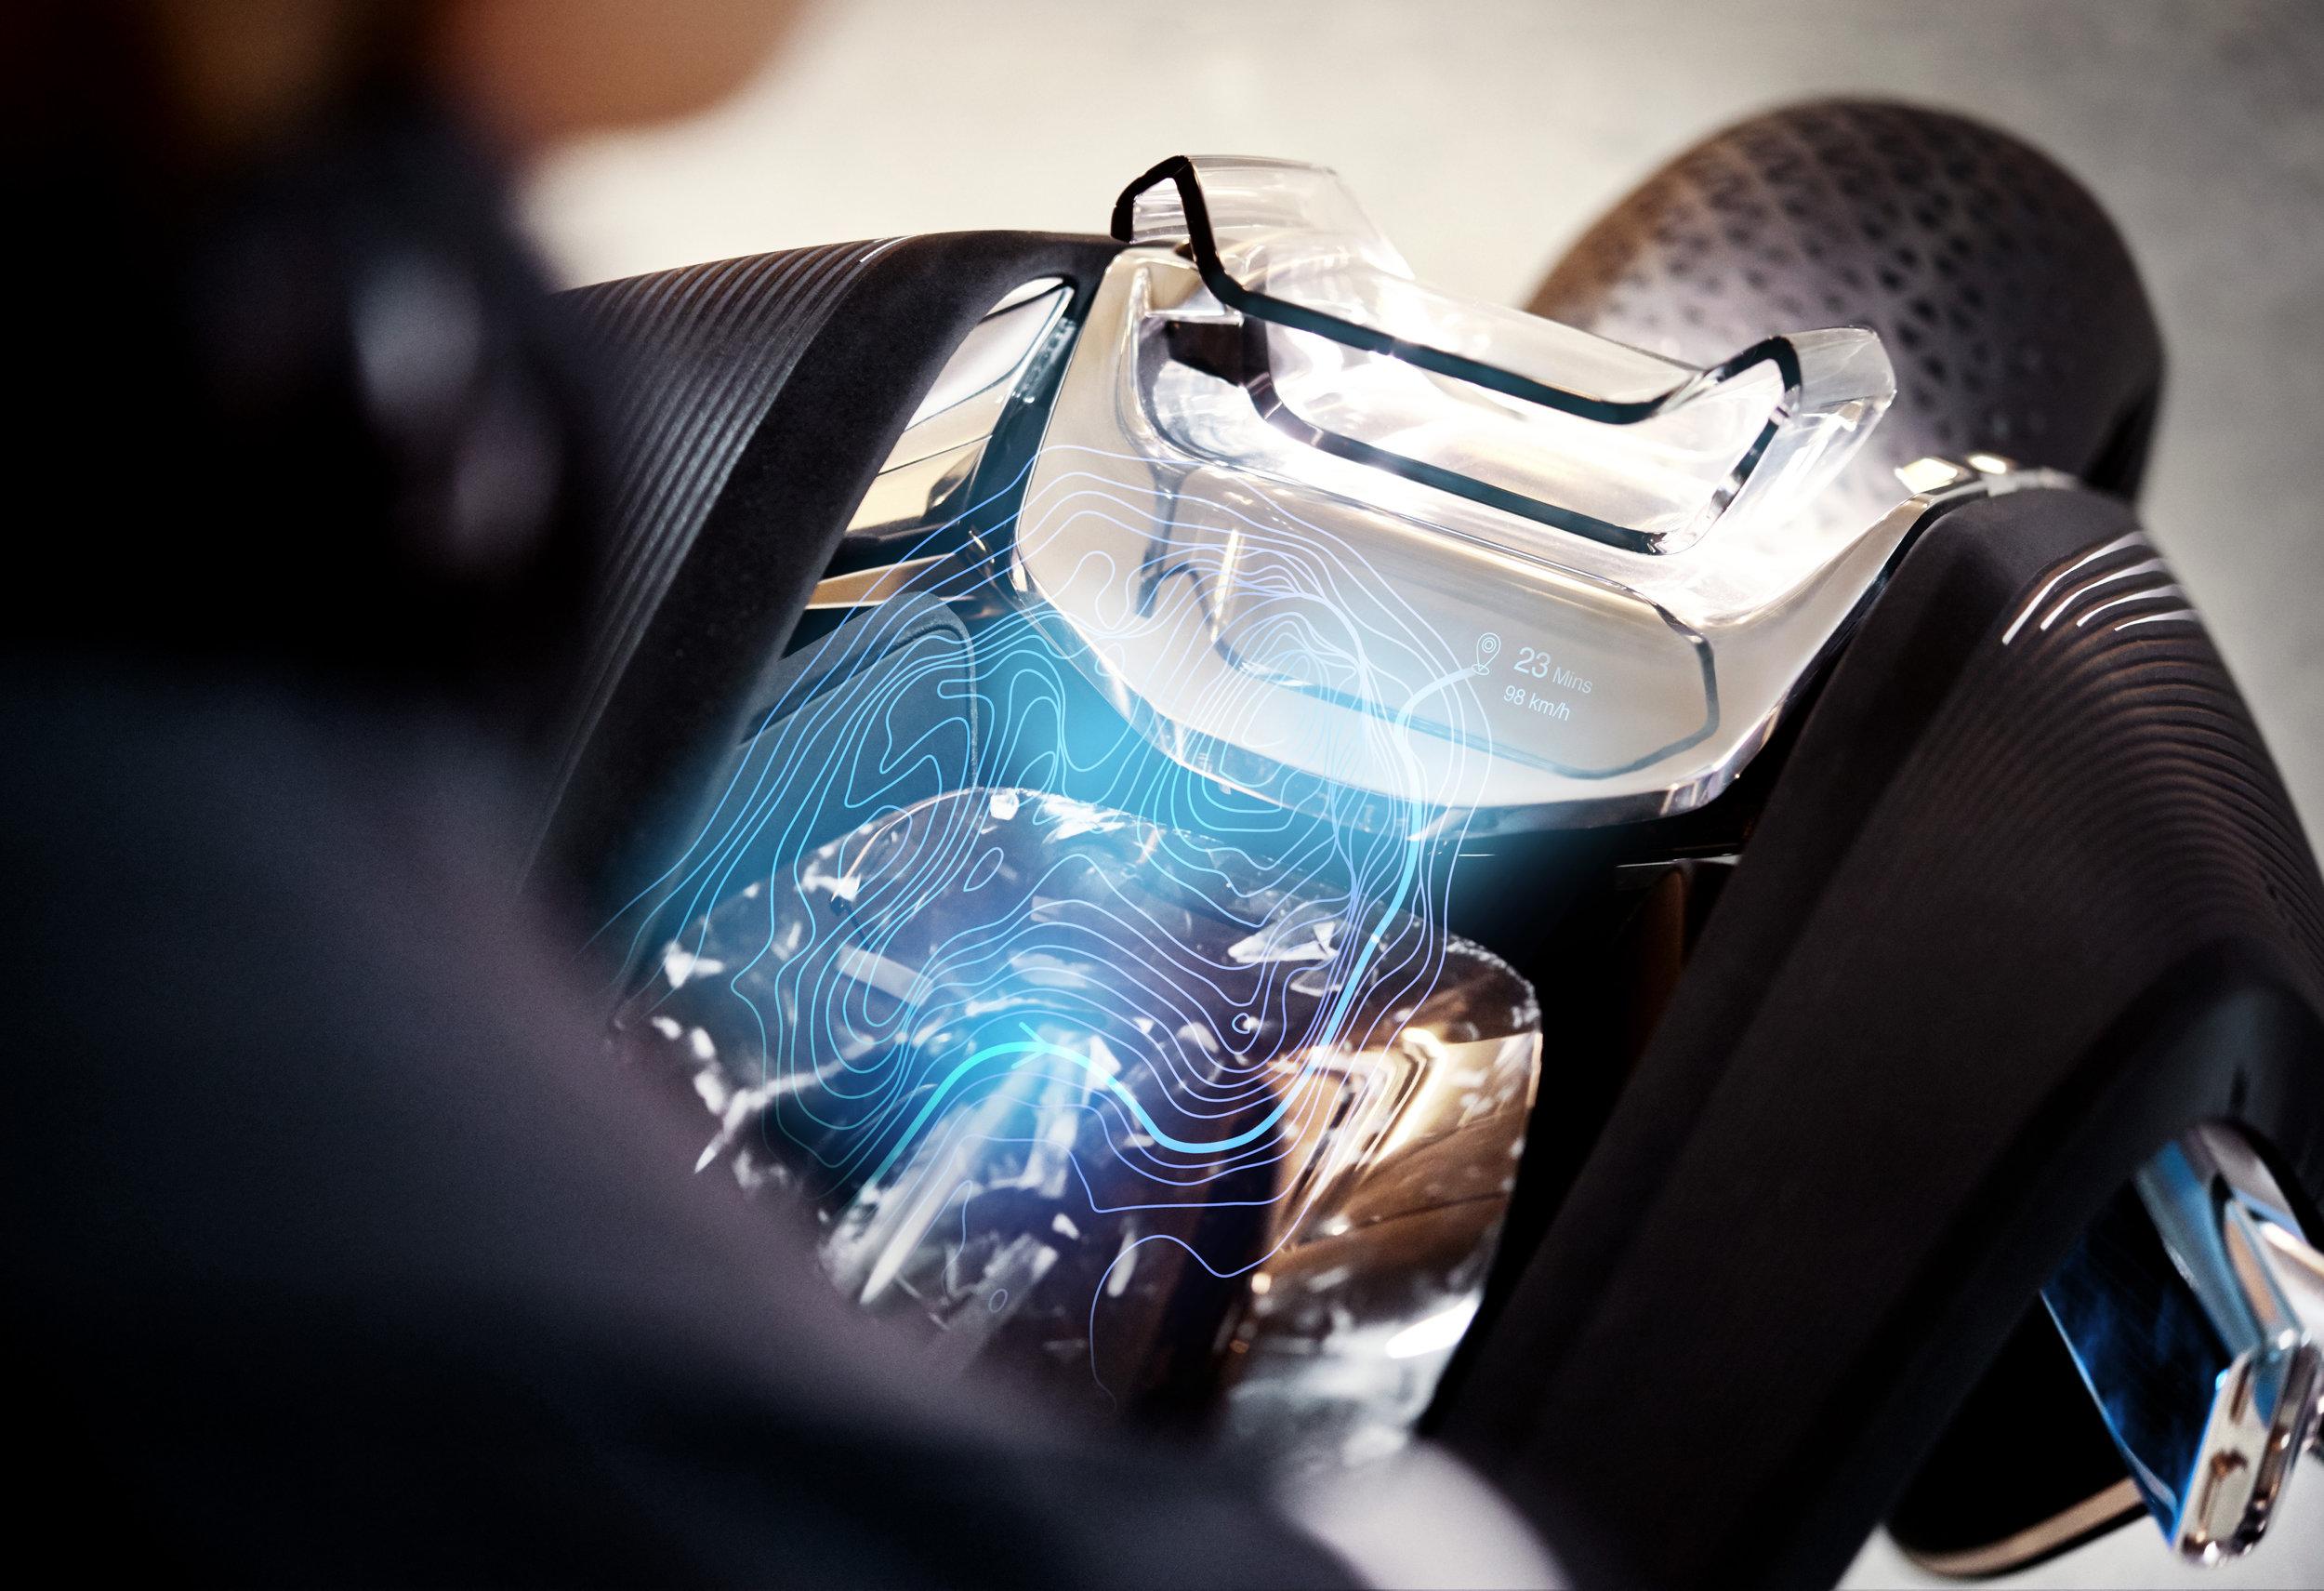 P90238715_highRes_bmw-motorrad-vision-.jpg